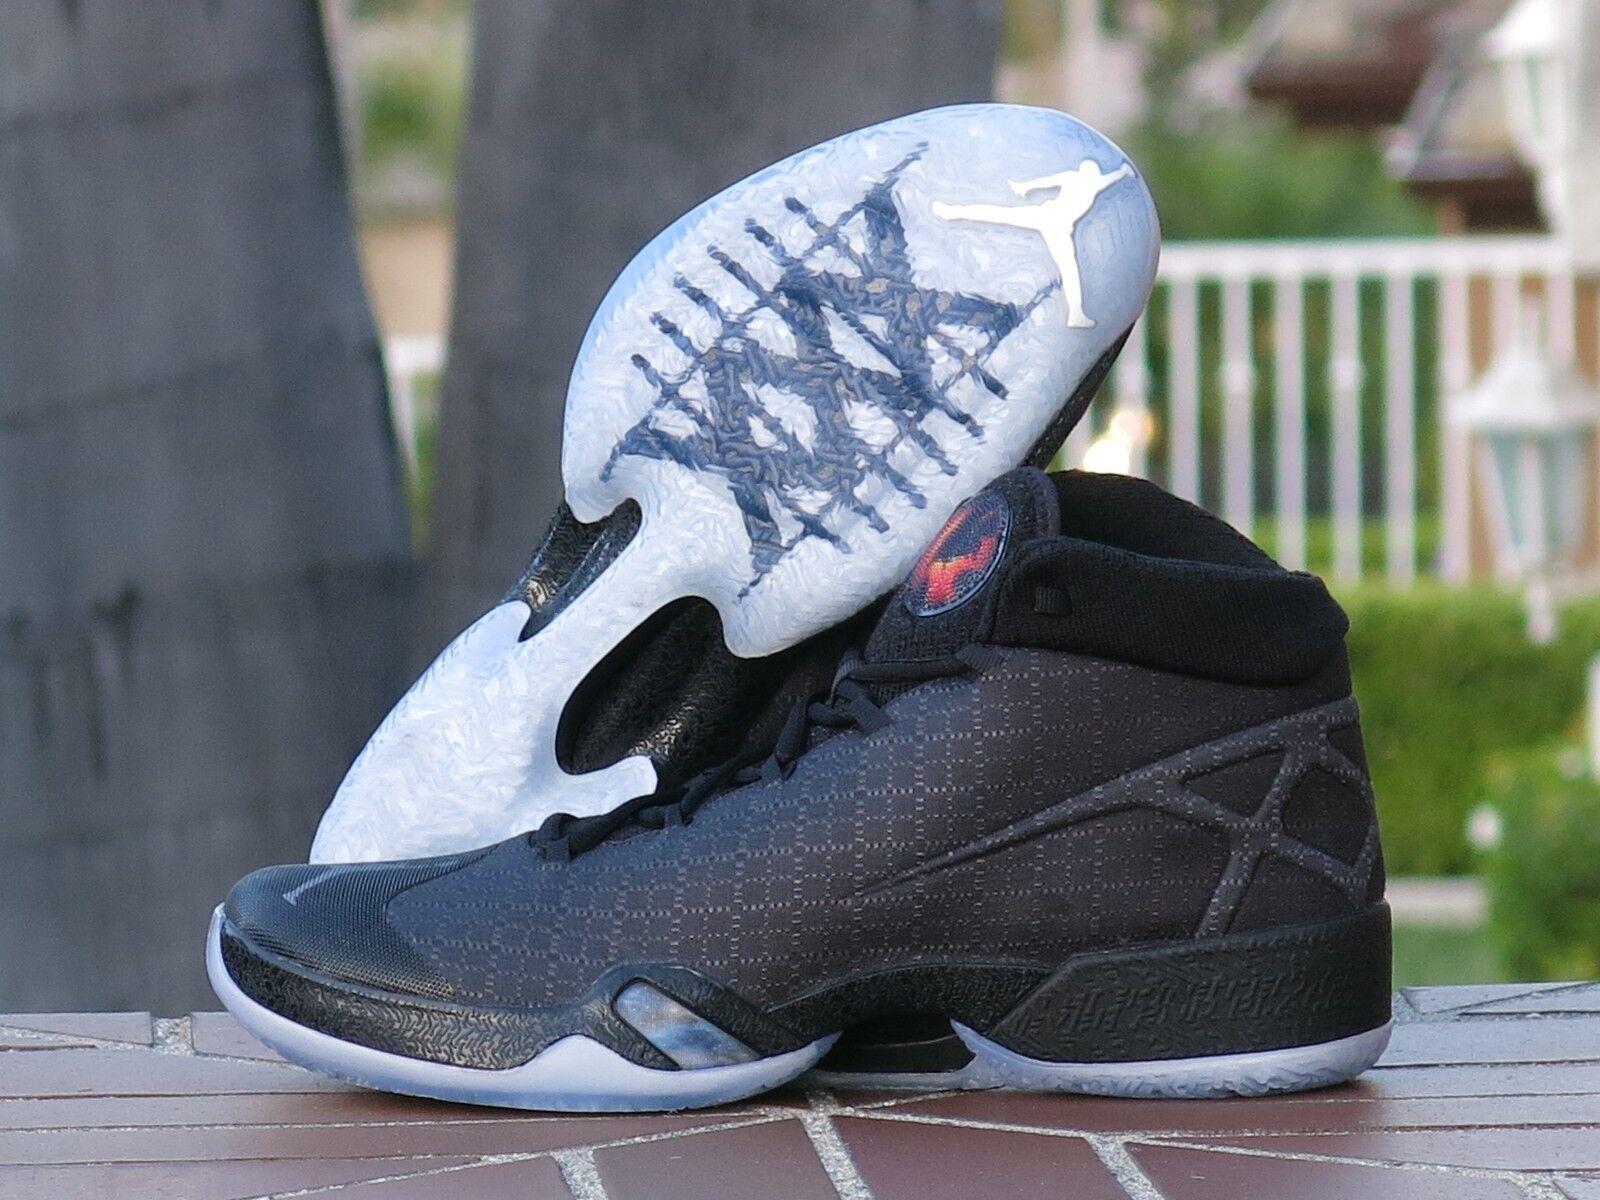 Nike Air Jordan XXX Uomo Nero Cat Uomo XXX Basketball  811006-010 SZ 11 fc5e6d